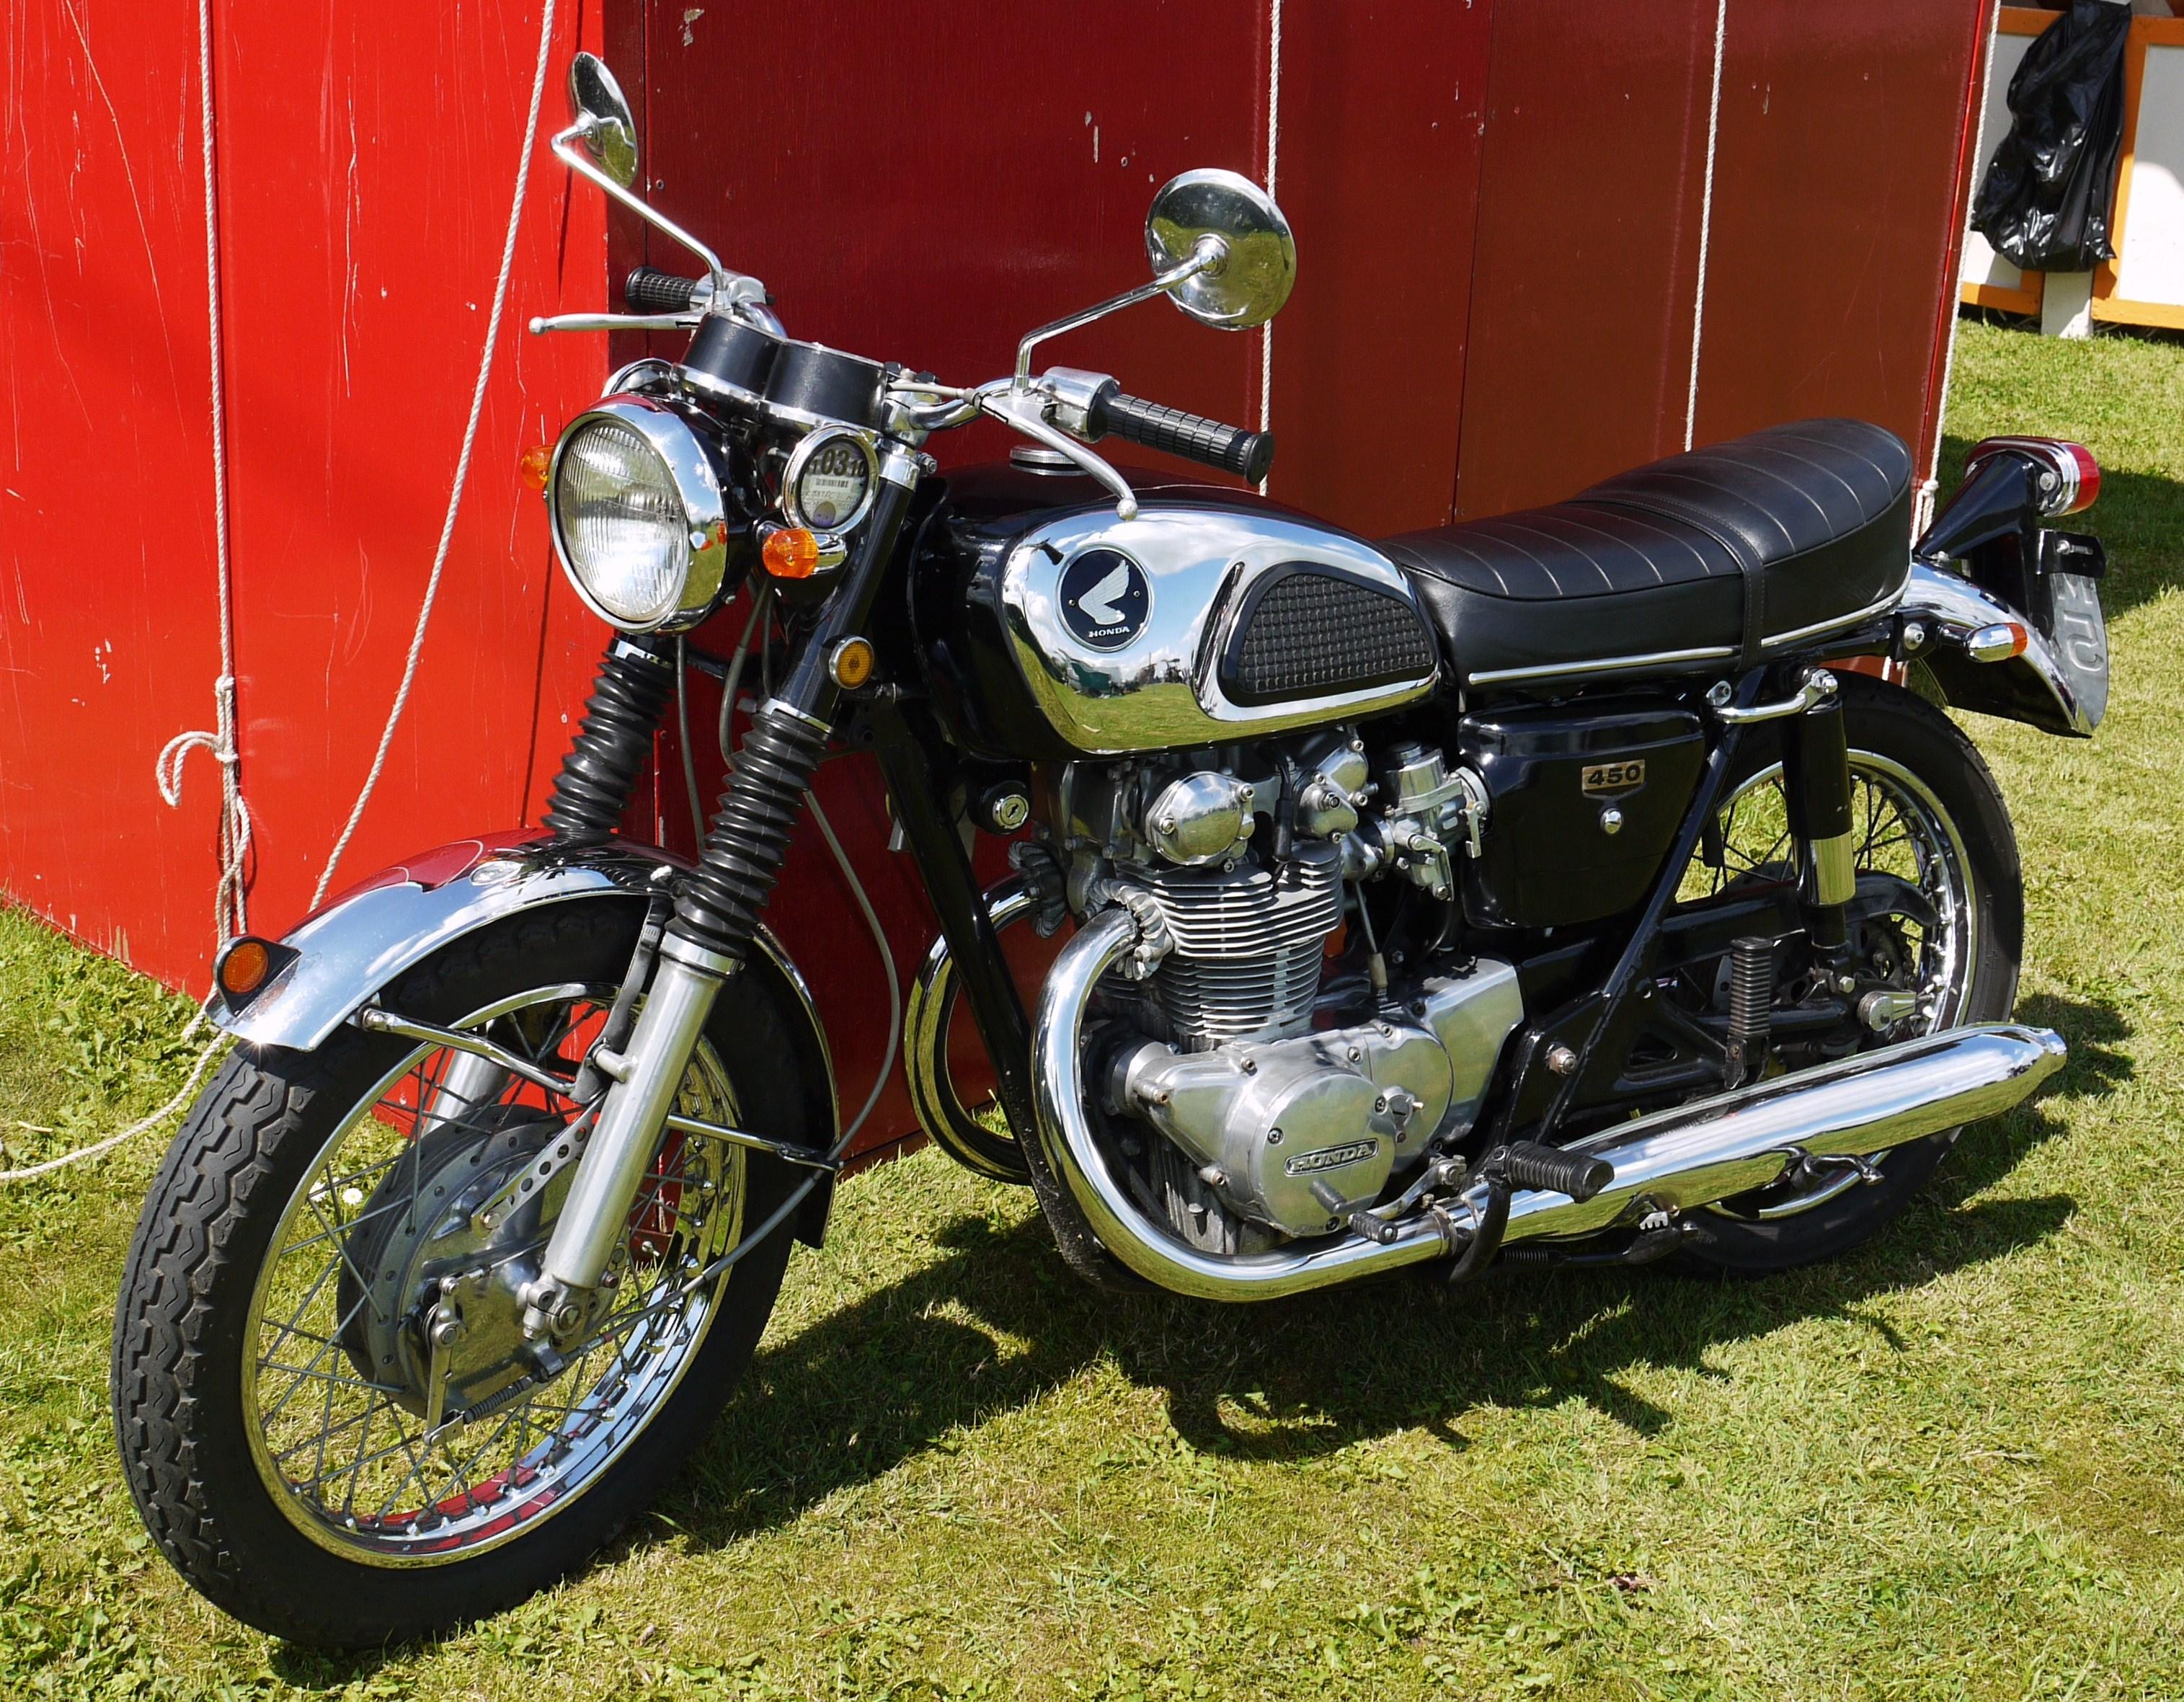 File:Honda 450cc Black er - Flickr - mick - Lumix.jpg ...